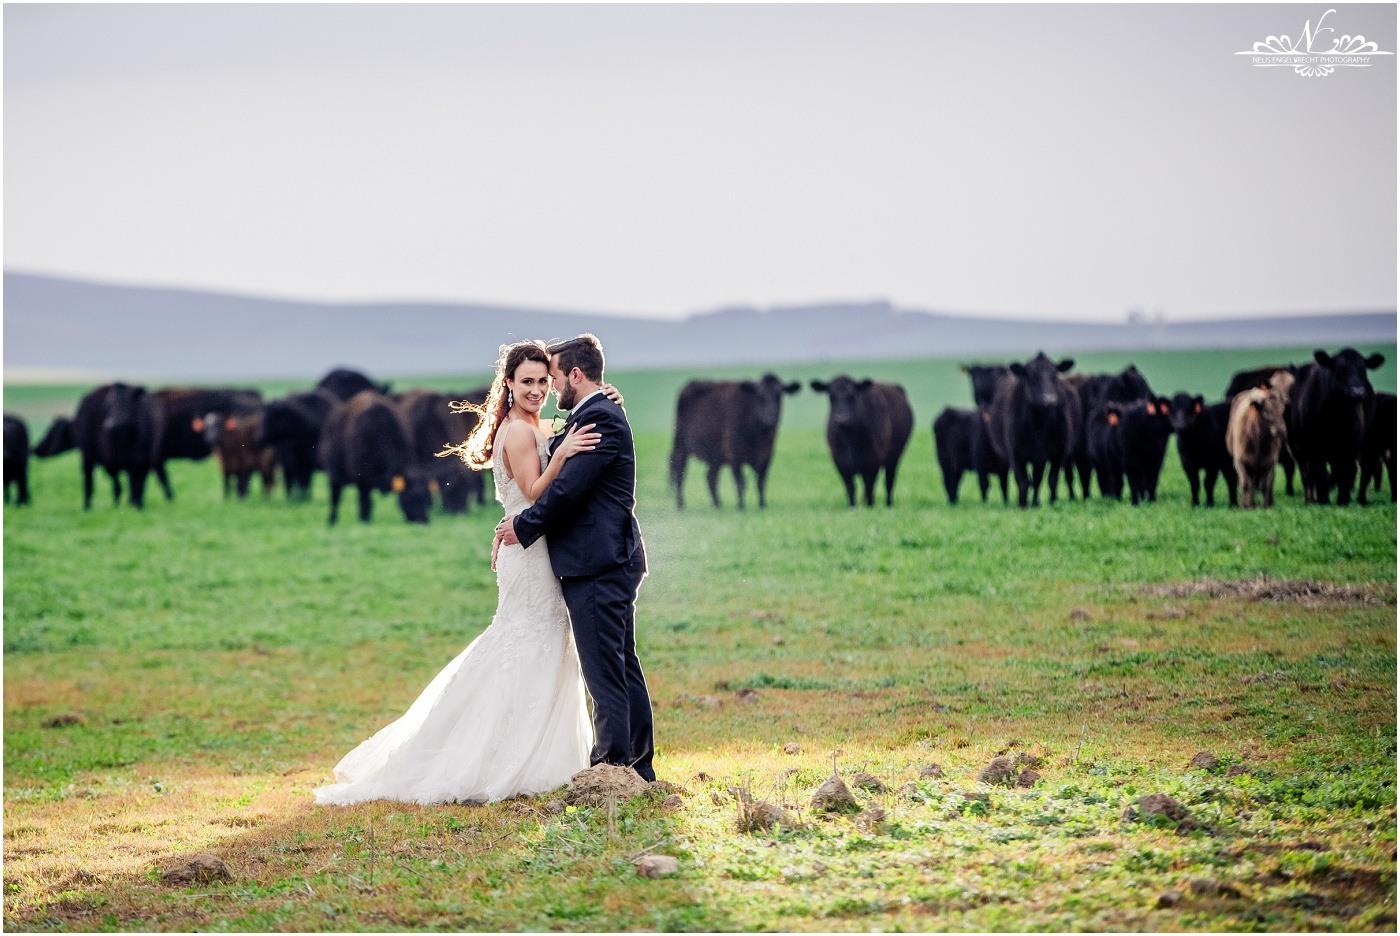 Eensgezind-Wedding-Photos-Nelis-Engelbrecht-Photography-166